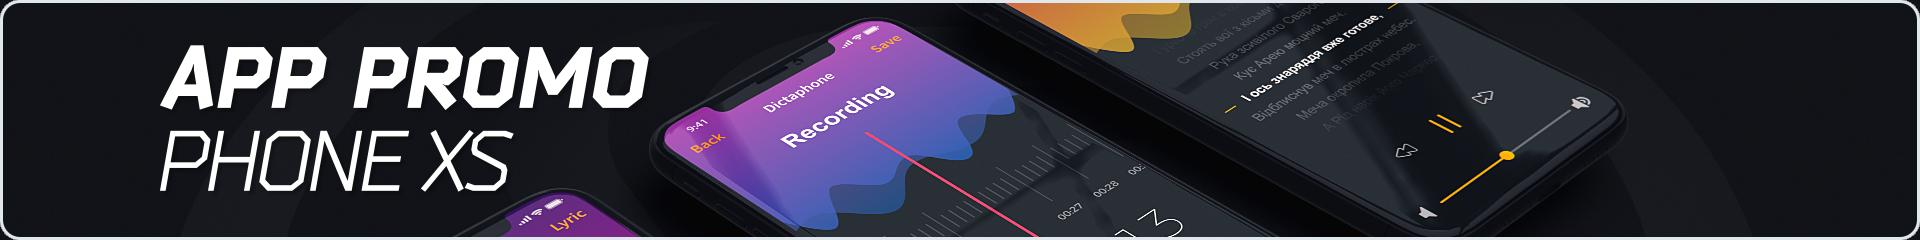 Android App Presentation   Mockup - 9